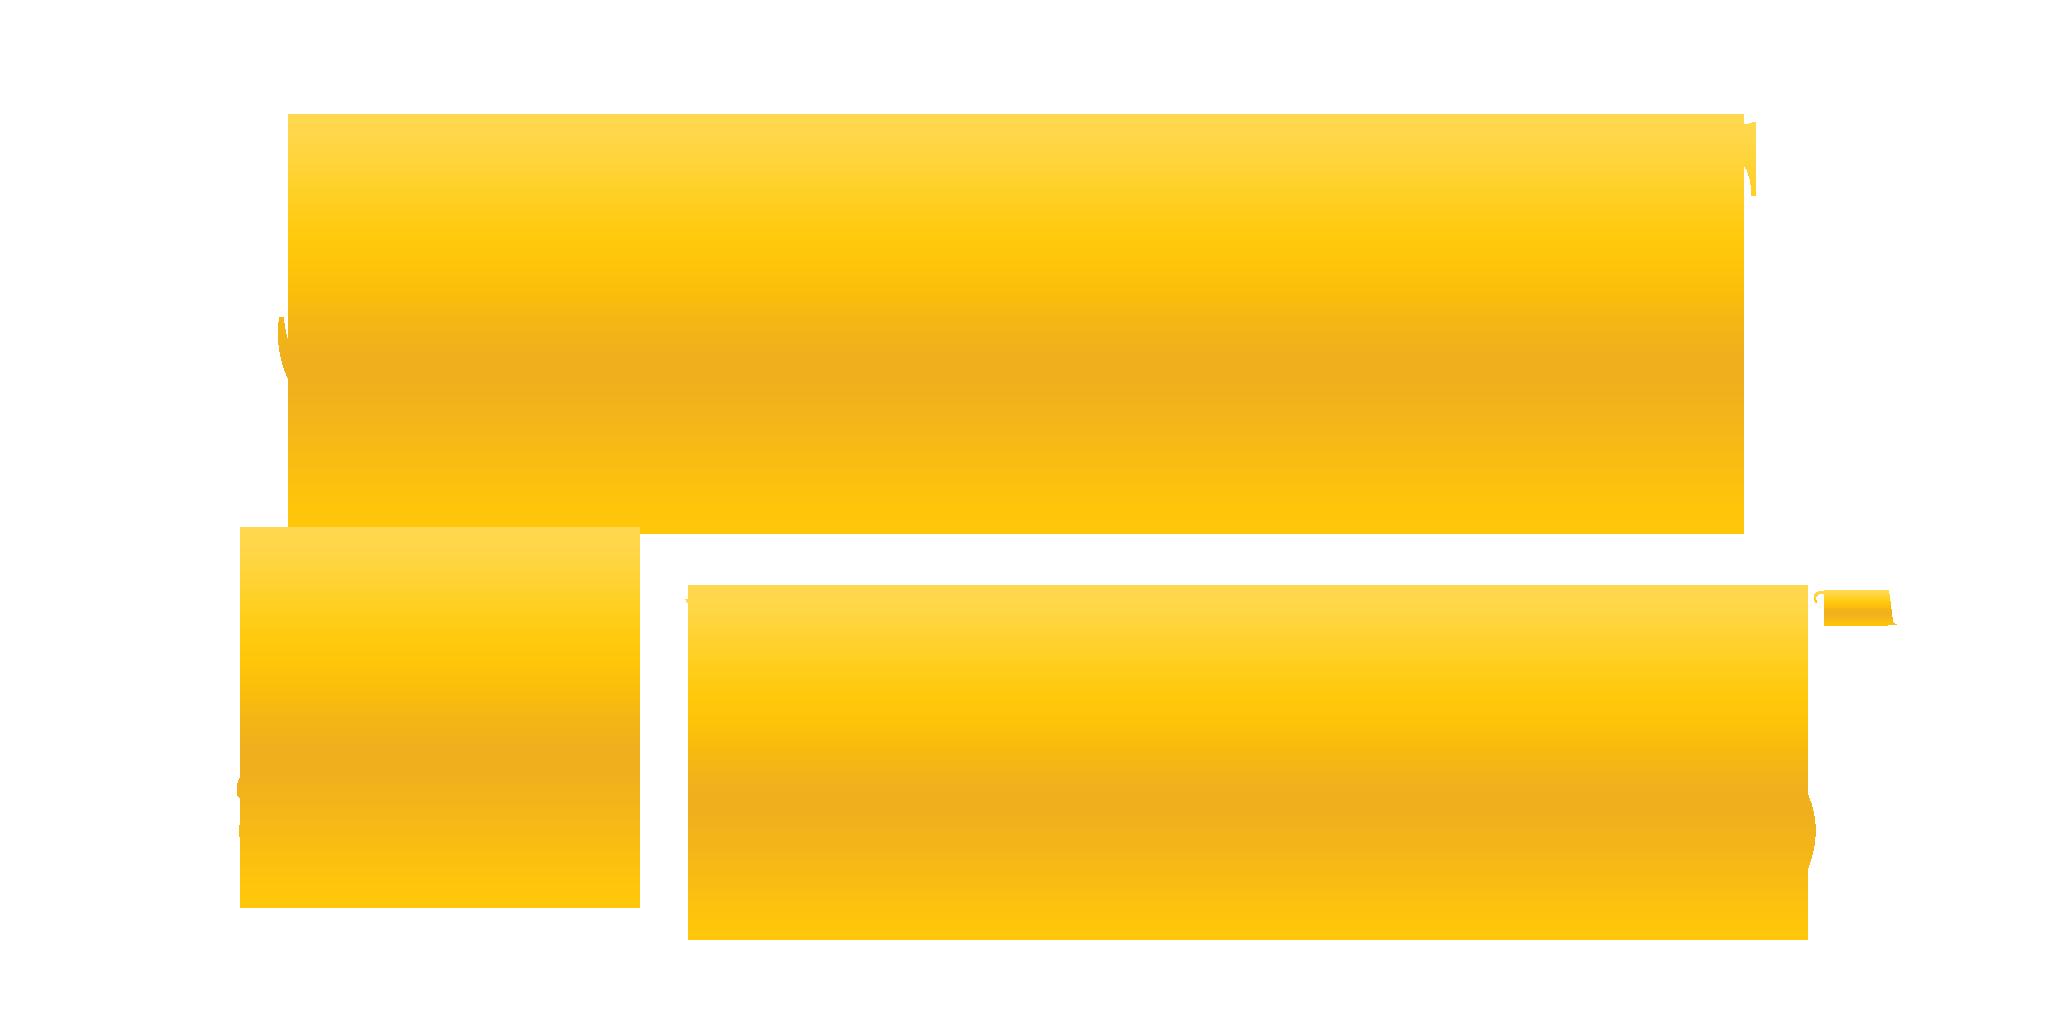 beastpets_logo_style2_transparent.png